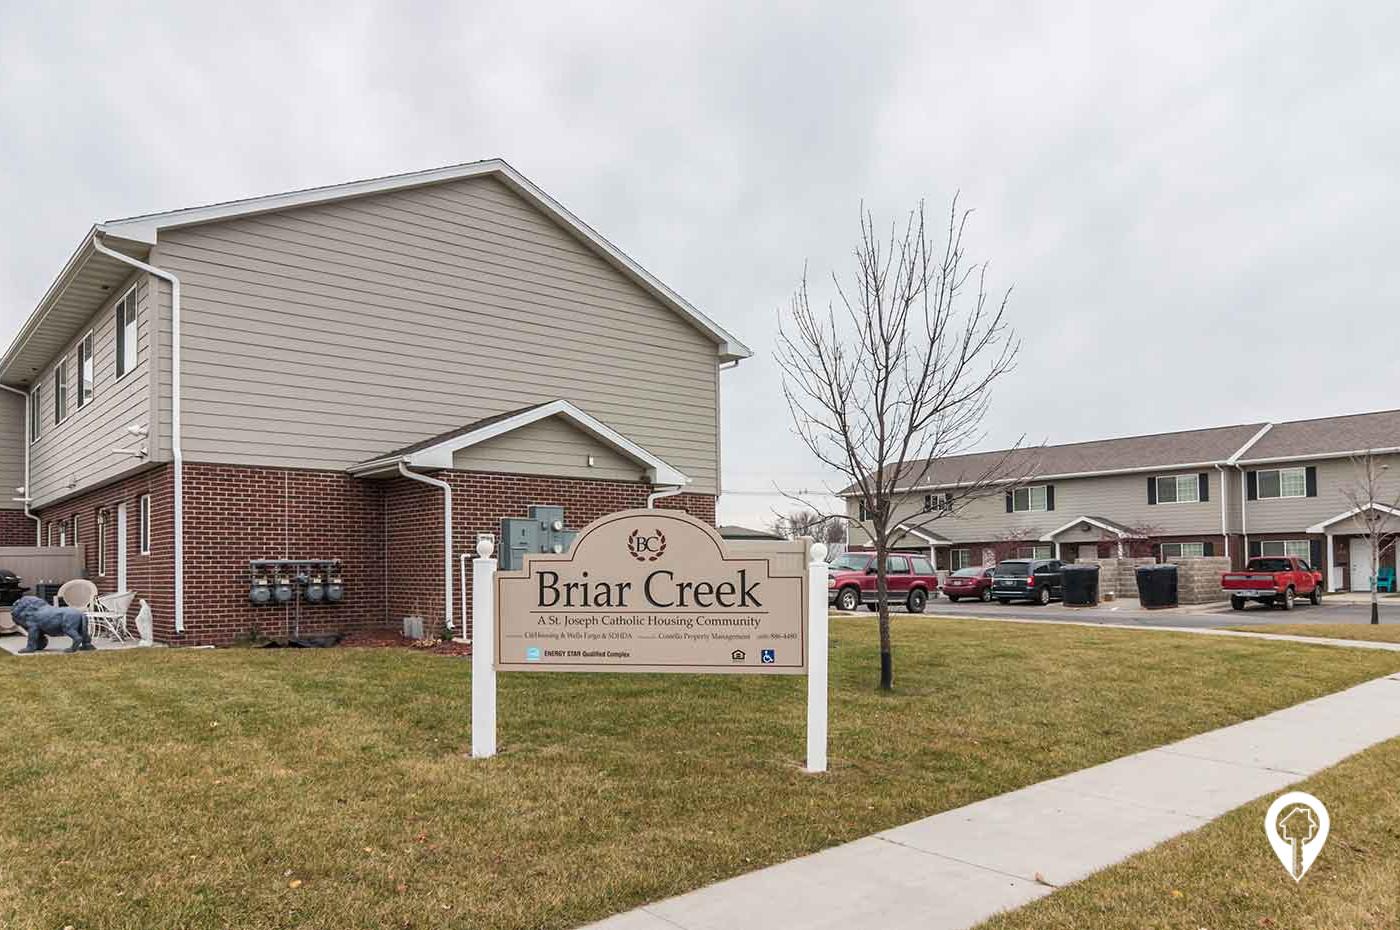 Briar Creek Townhomes